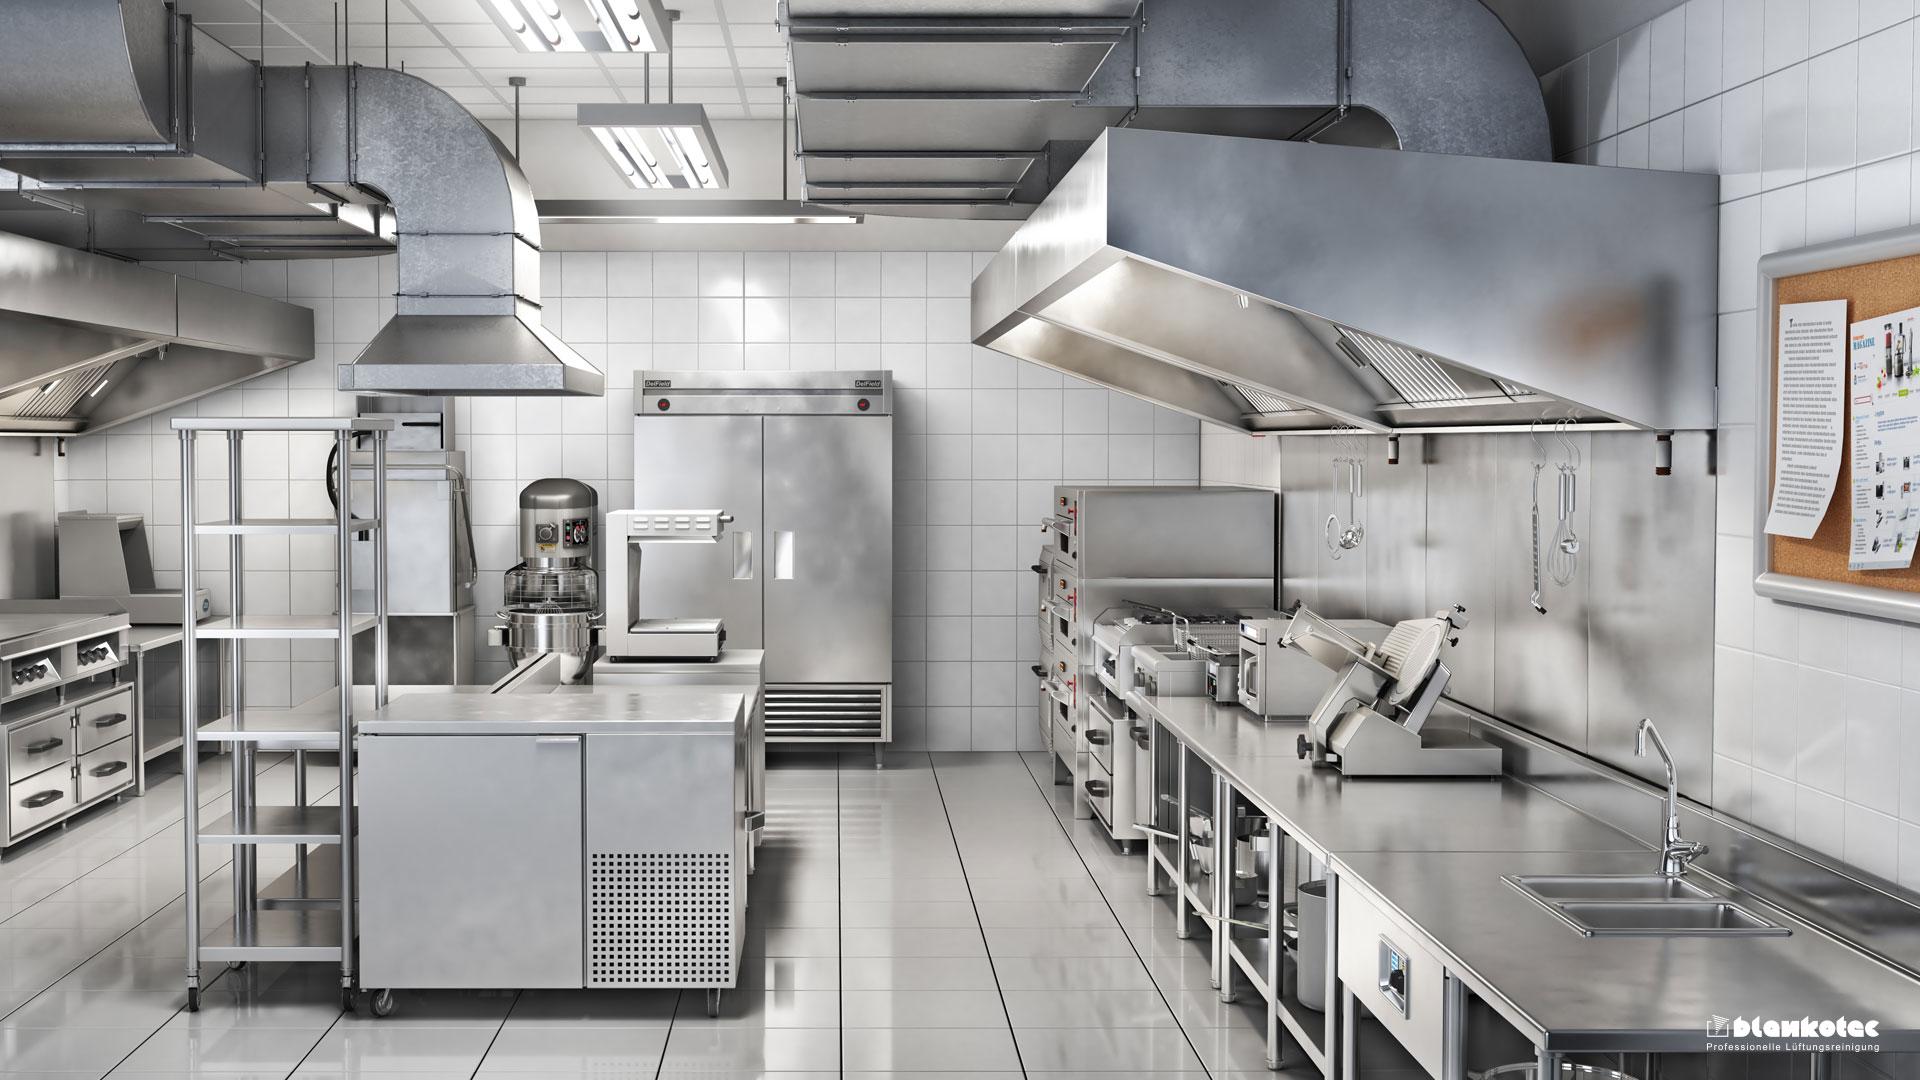 Blankotec Corona Gastro Küchen Desinfektion